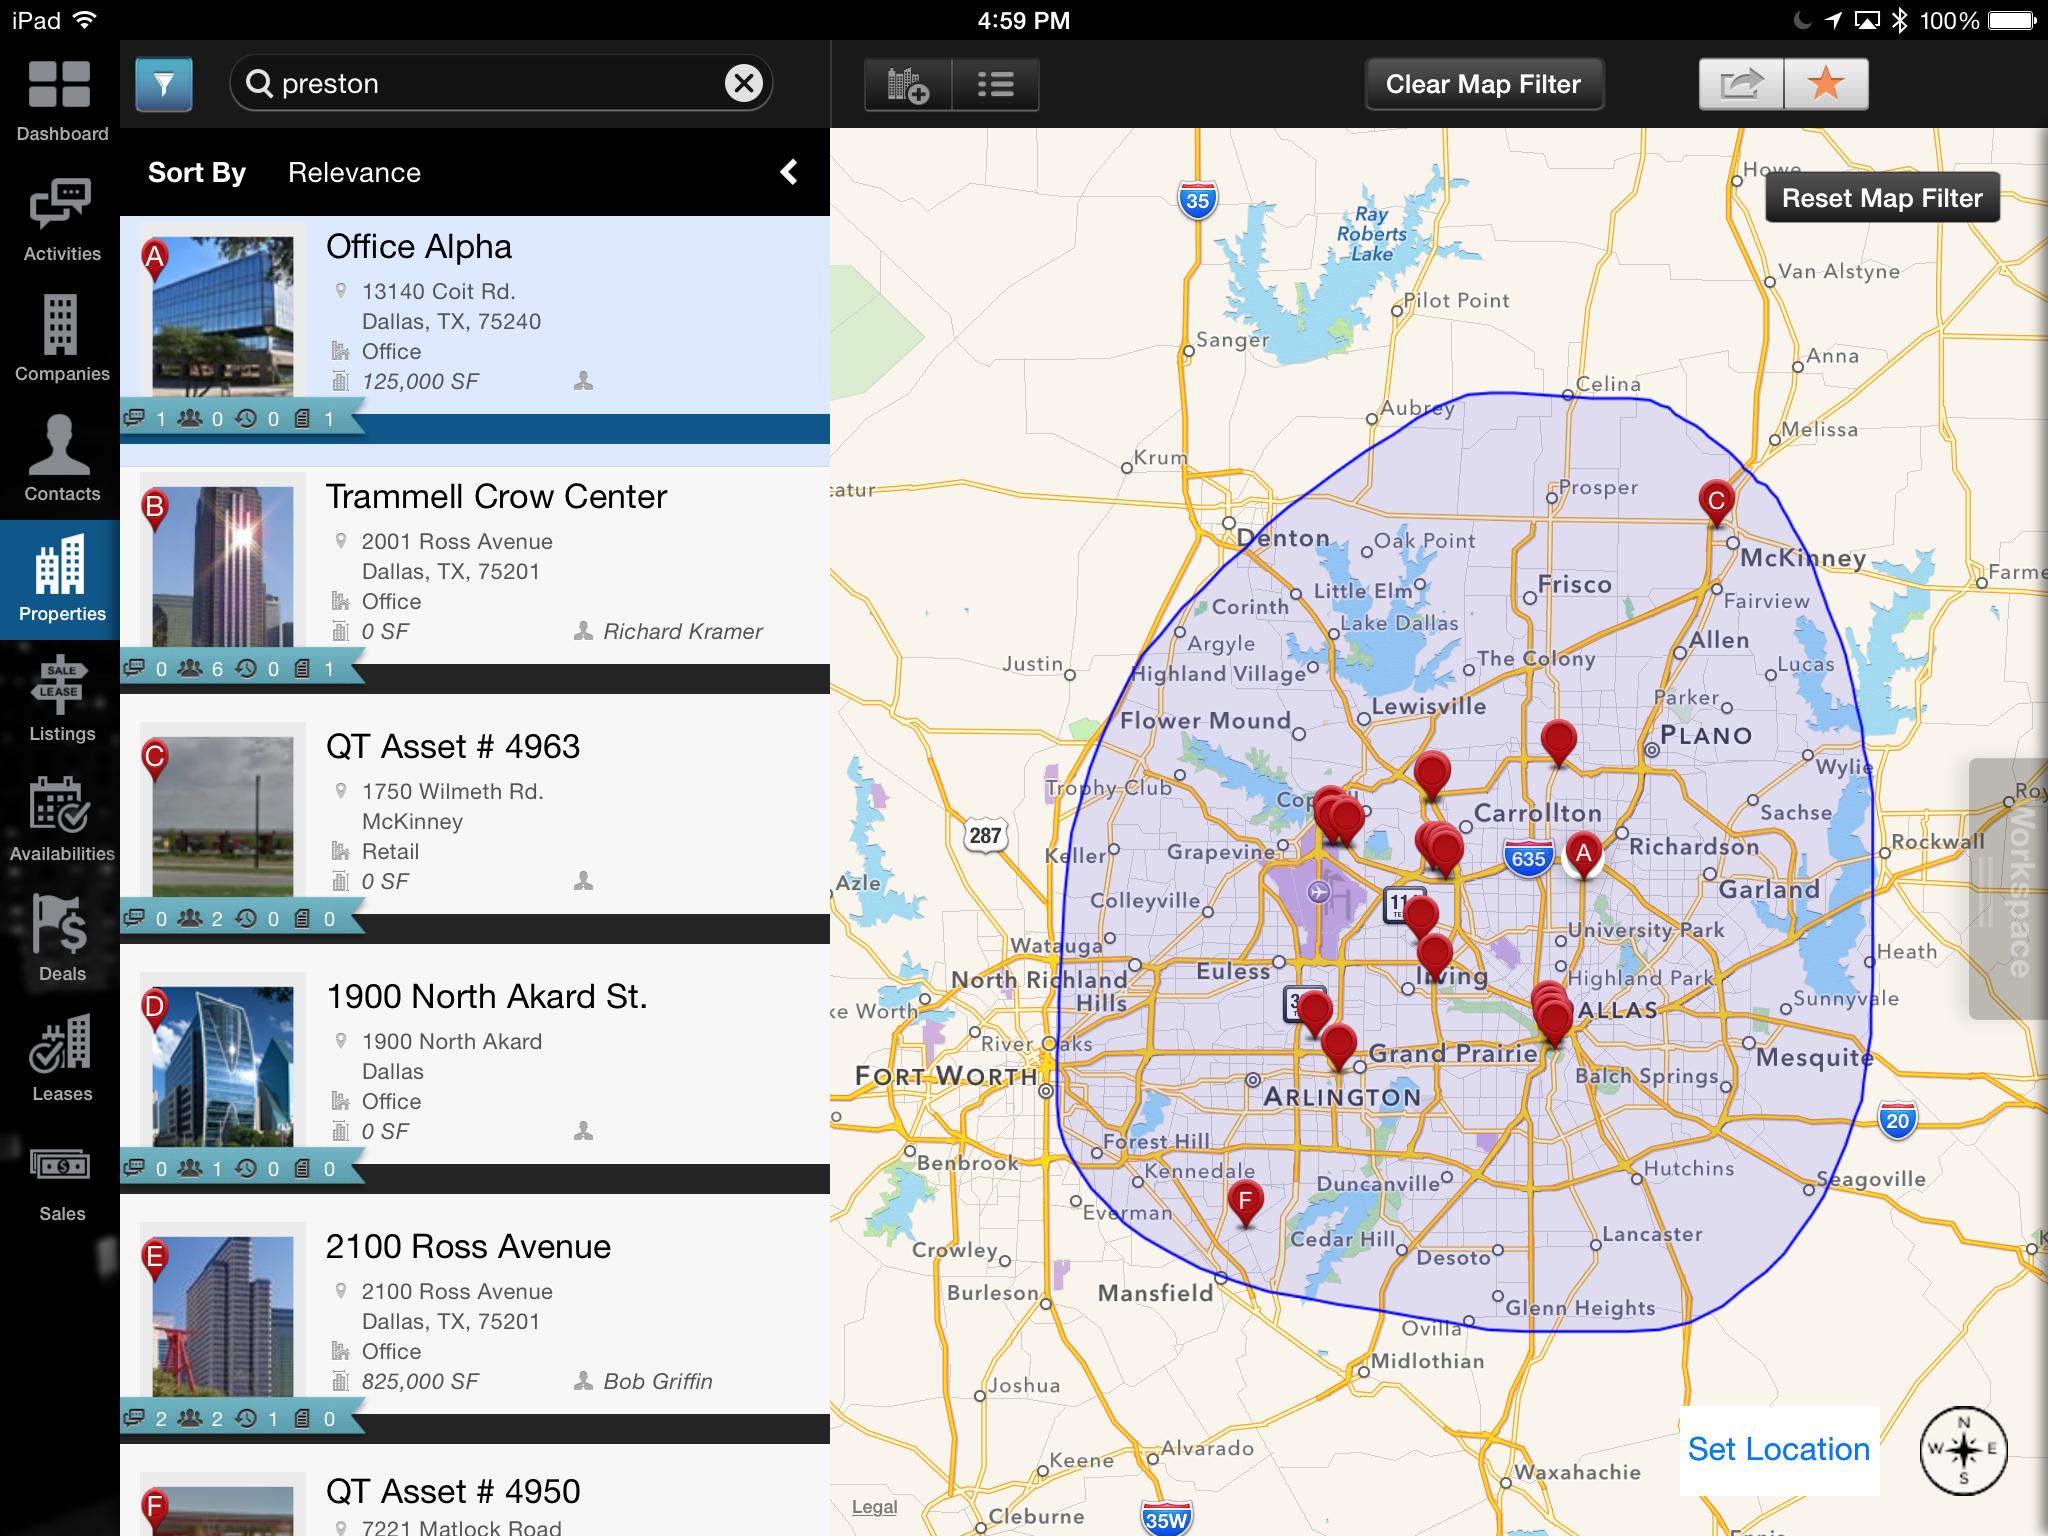 xRE iPad Mapping Technology